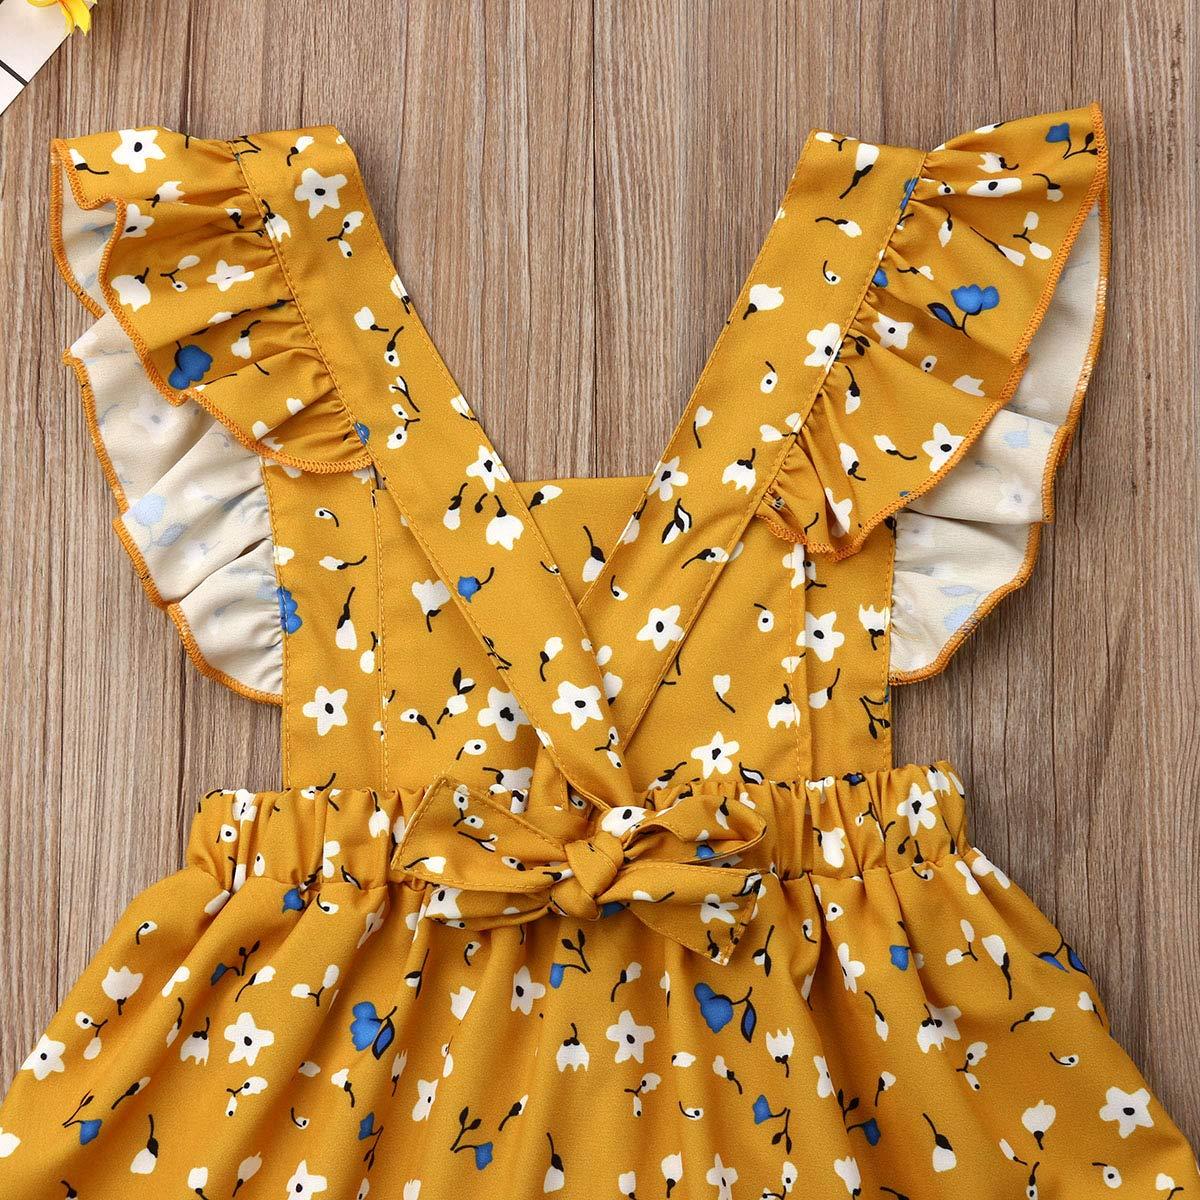 Infant Toddler Baby Girl Sleeveless Dress Summer Backless Floral Pleated Flounced Sundress